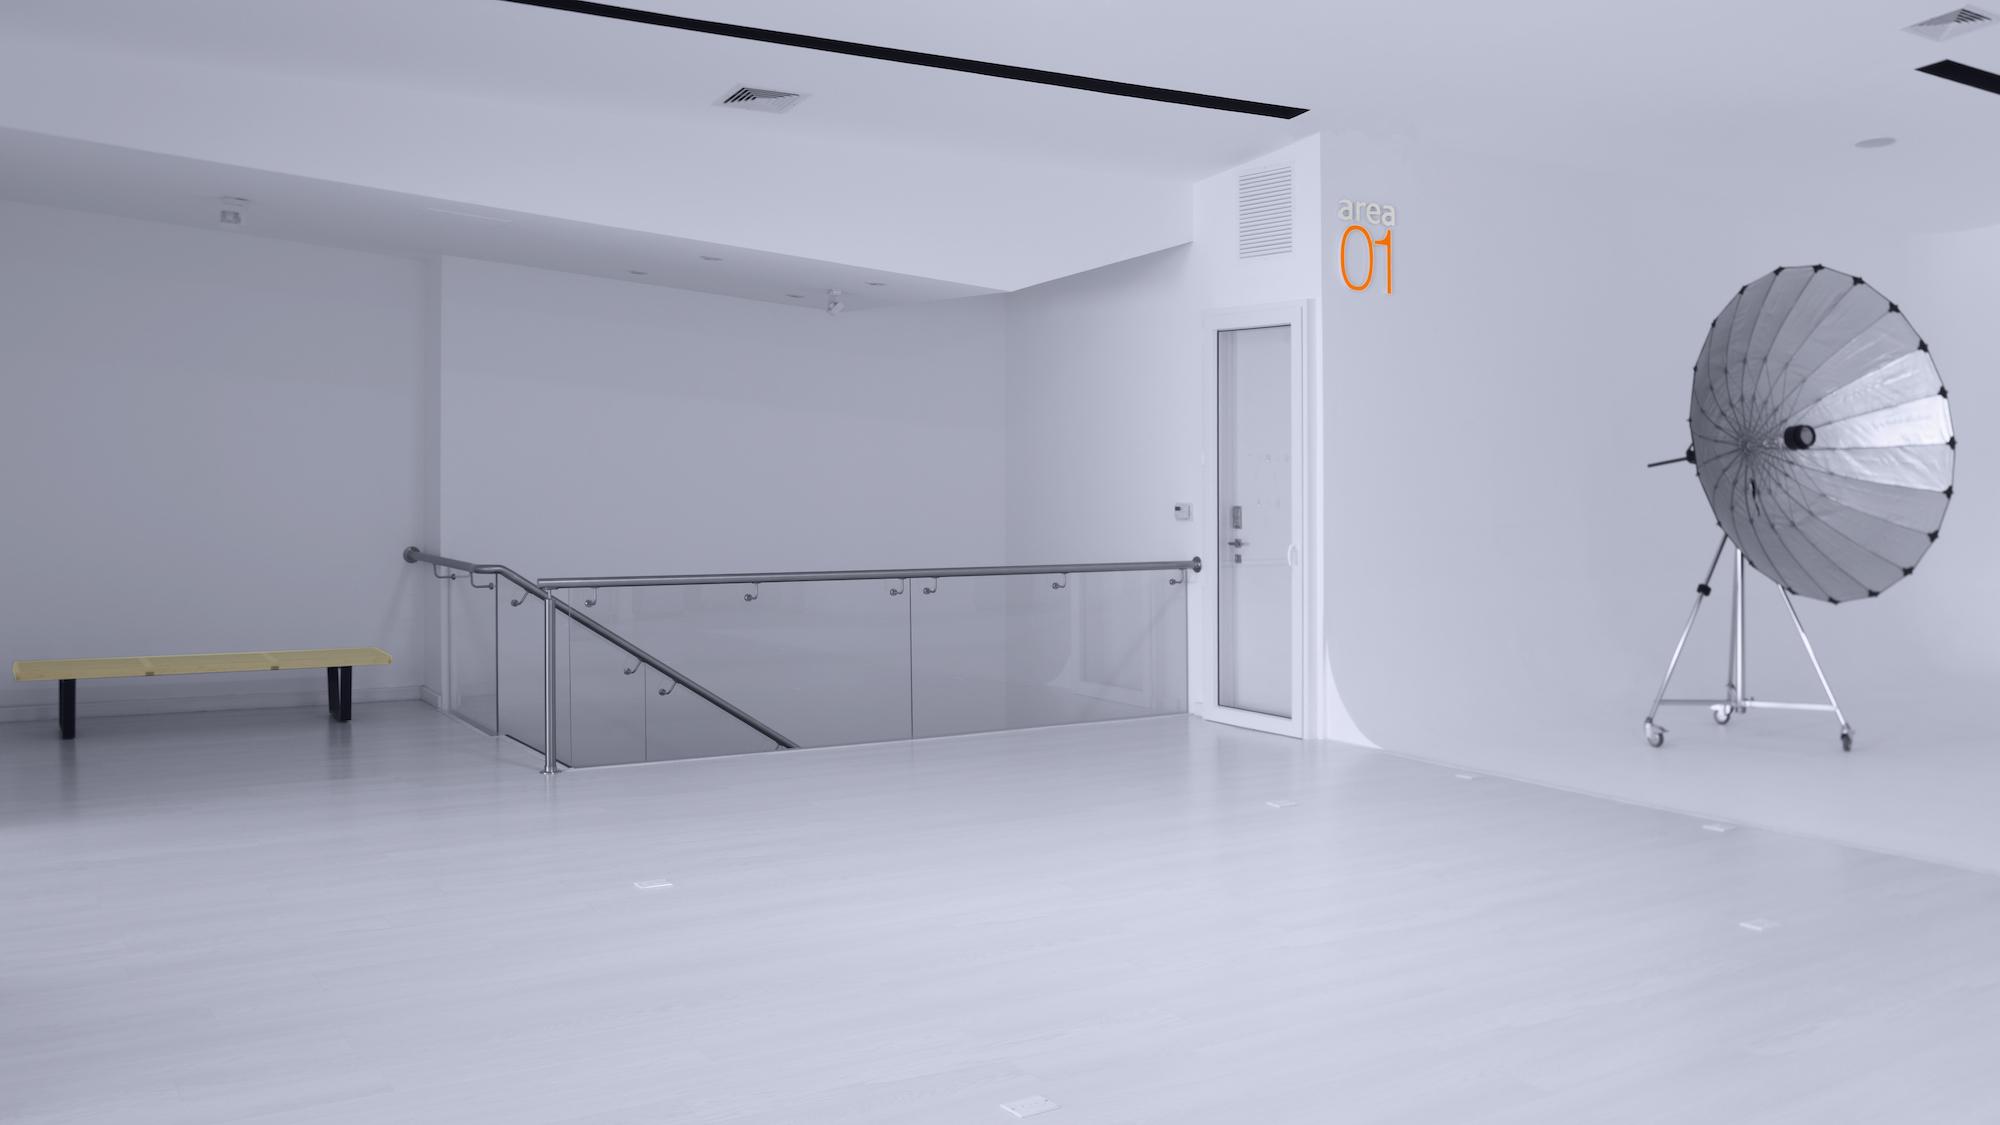 Studio 01-4.jpg